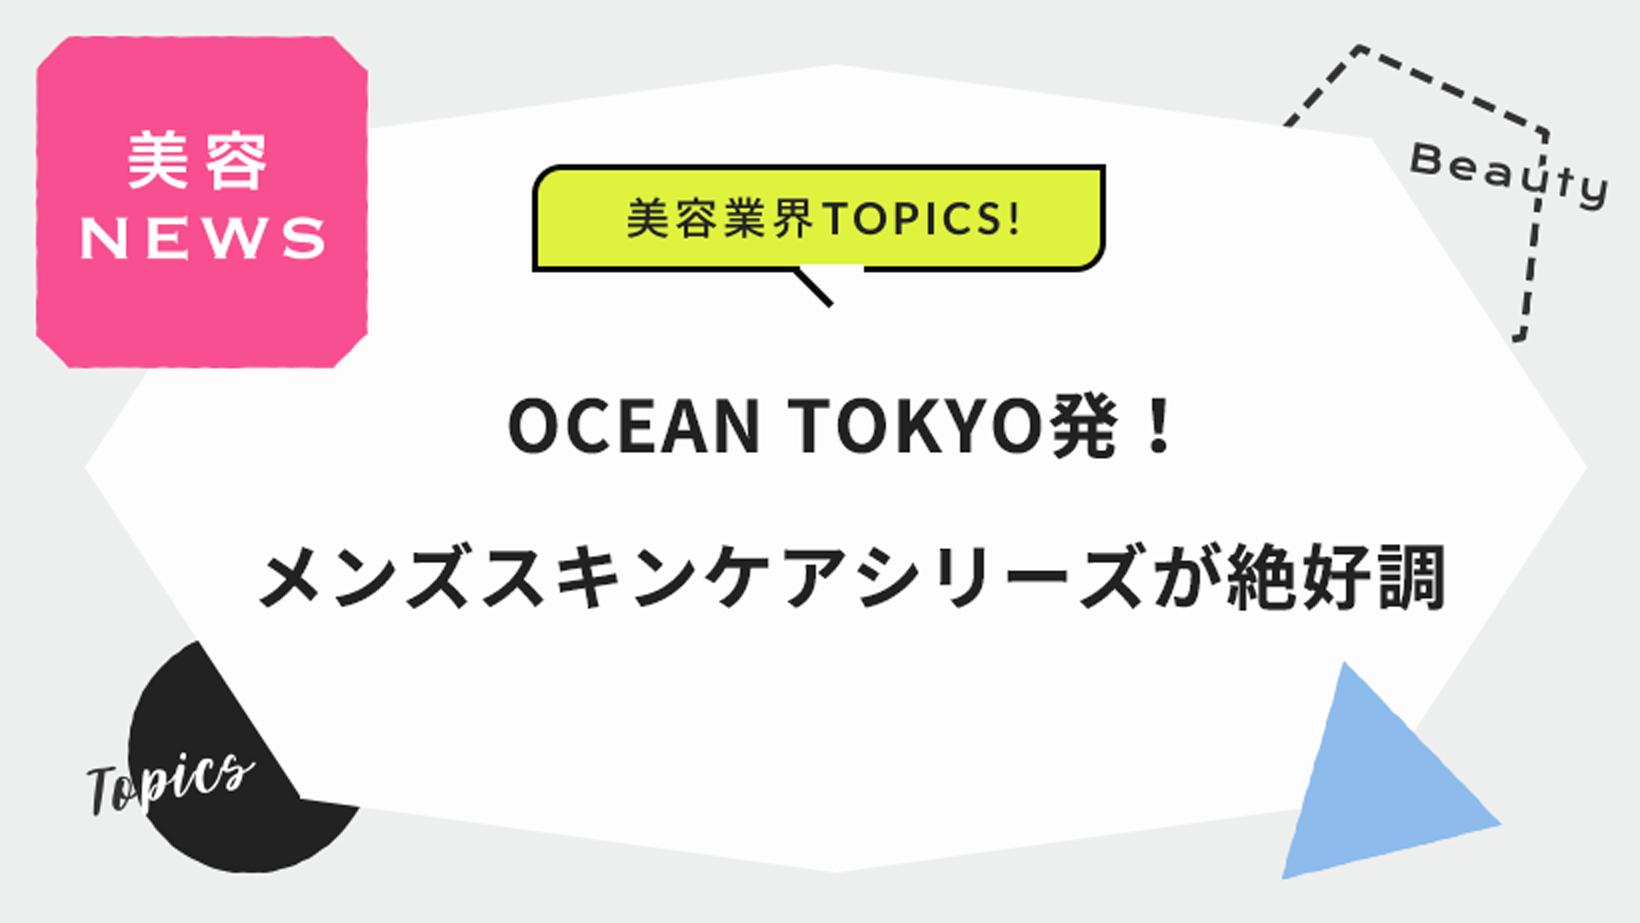 OCEAN TOKYO発!メンズスキンケアシリーズが絶好調